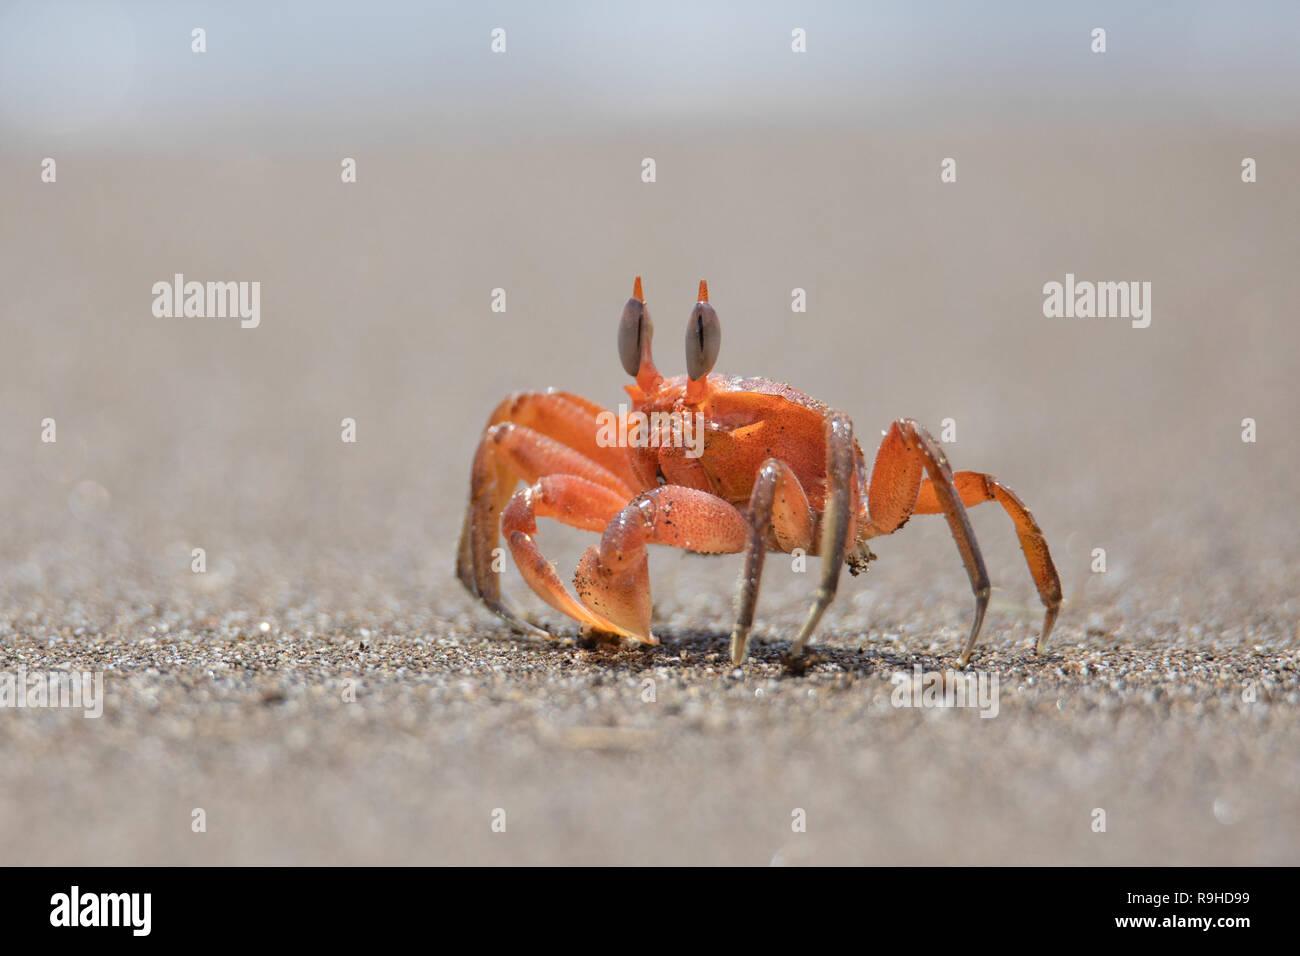 Red ghost crab cangrejo fantasma rojo Isla de la Plata Ecuador Stock Photo